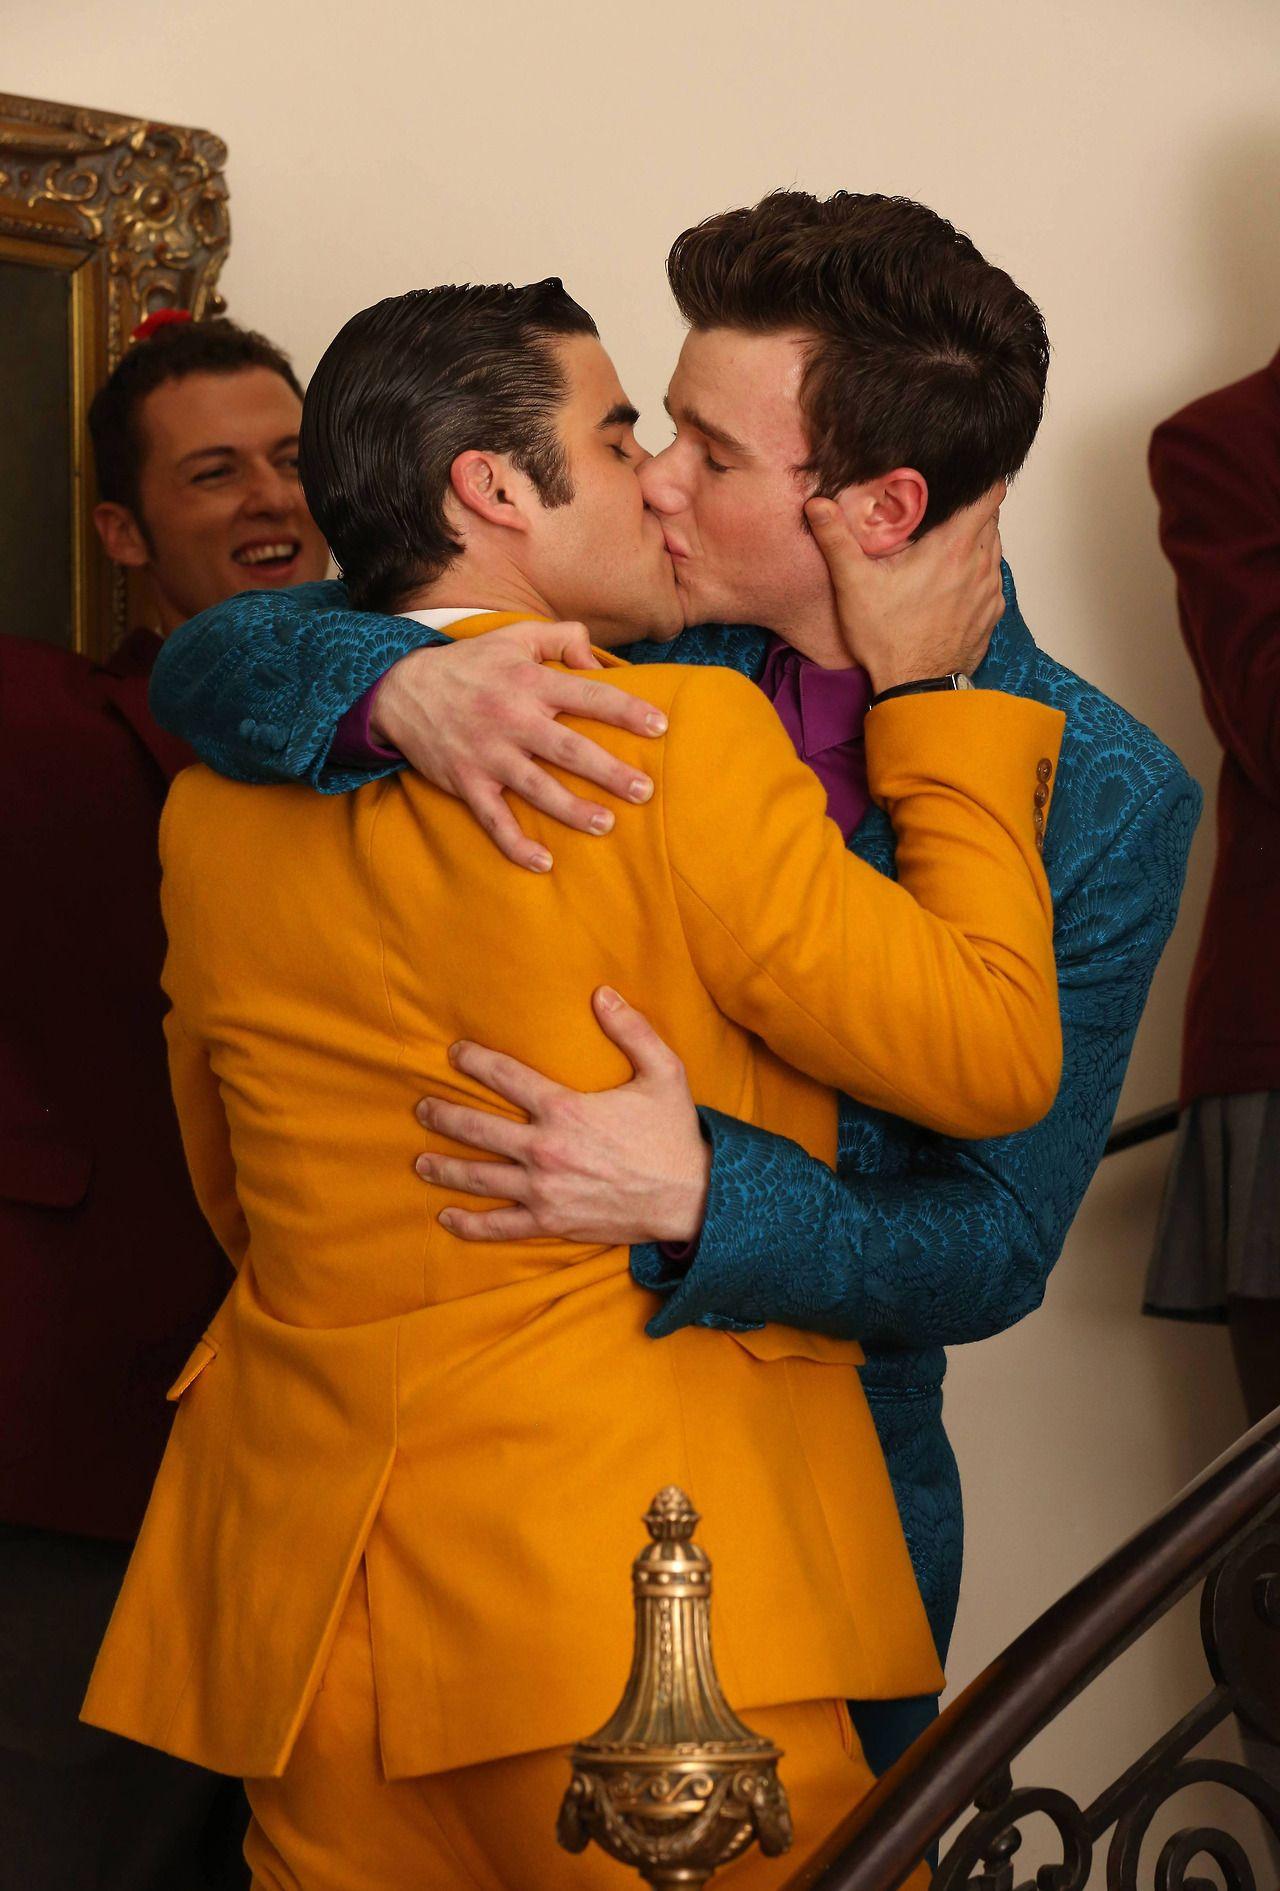 Glee Kurt Blaine Kiss: Kurt_blaine_kiss In 2019